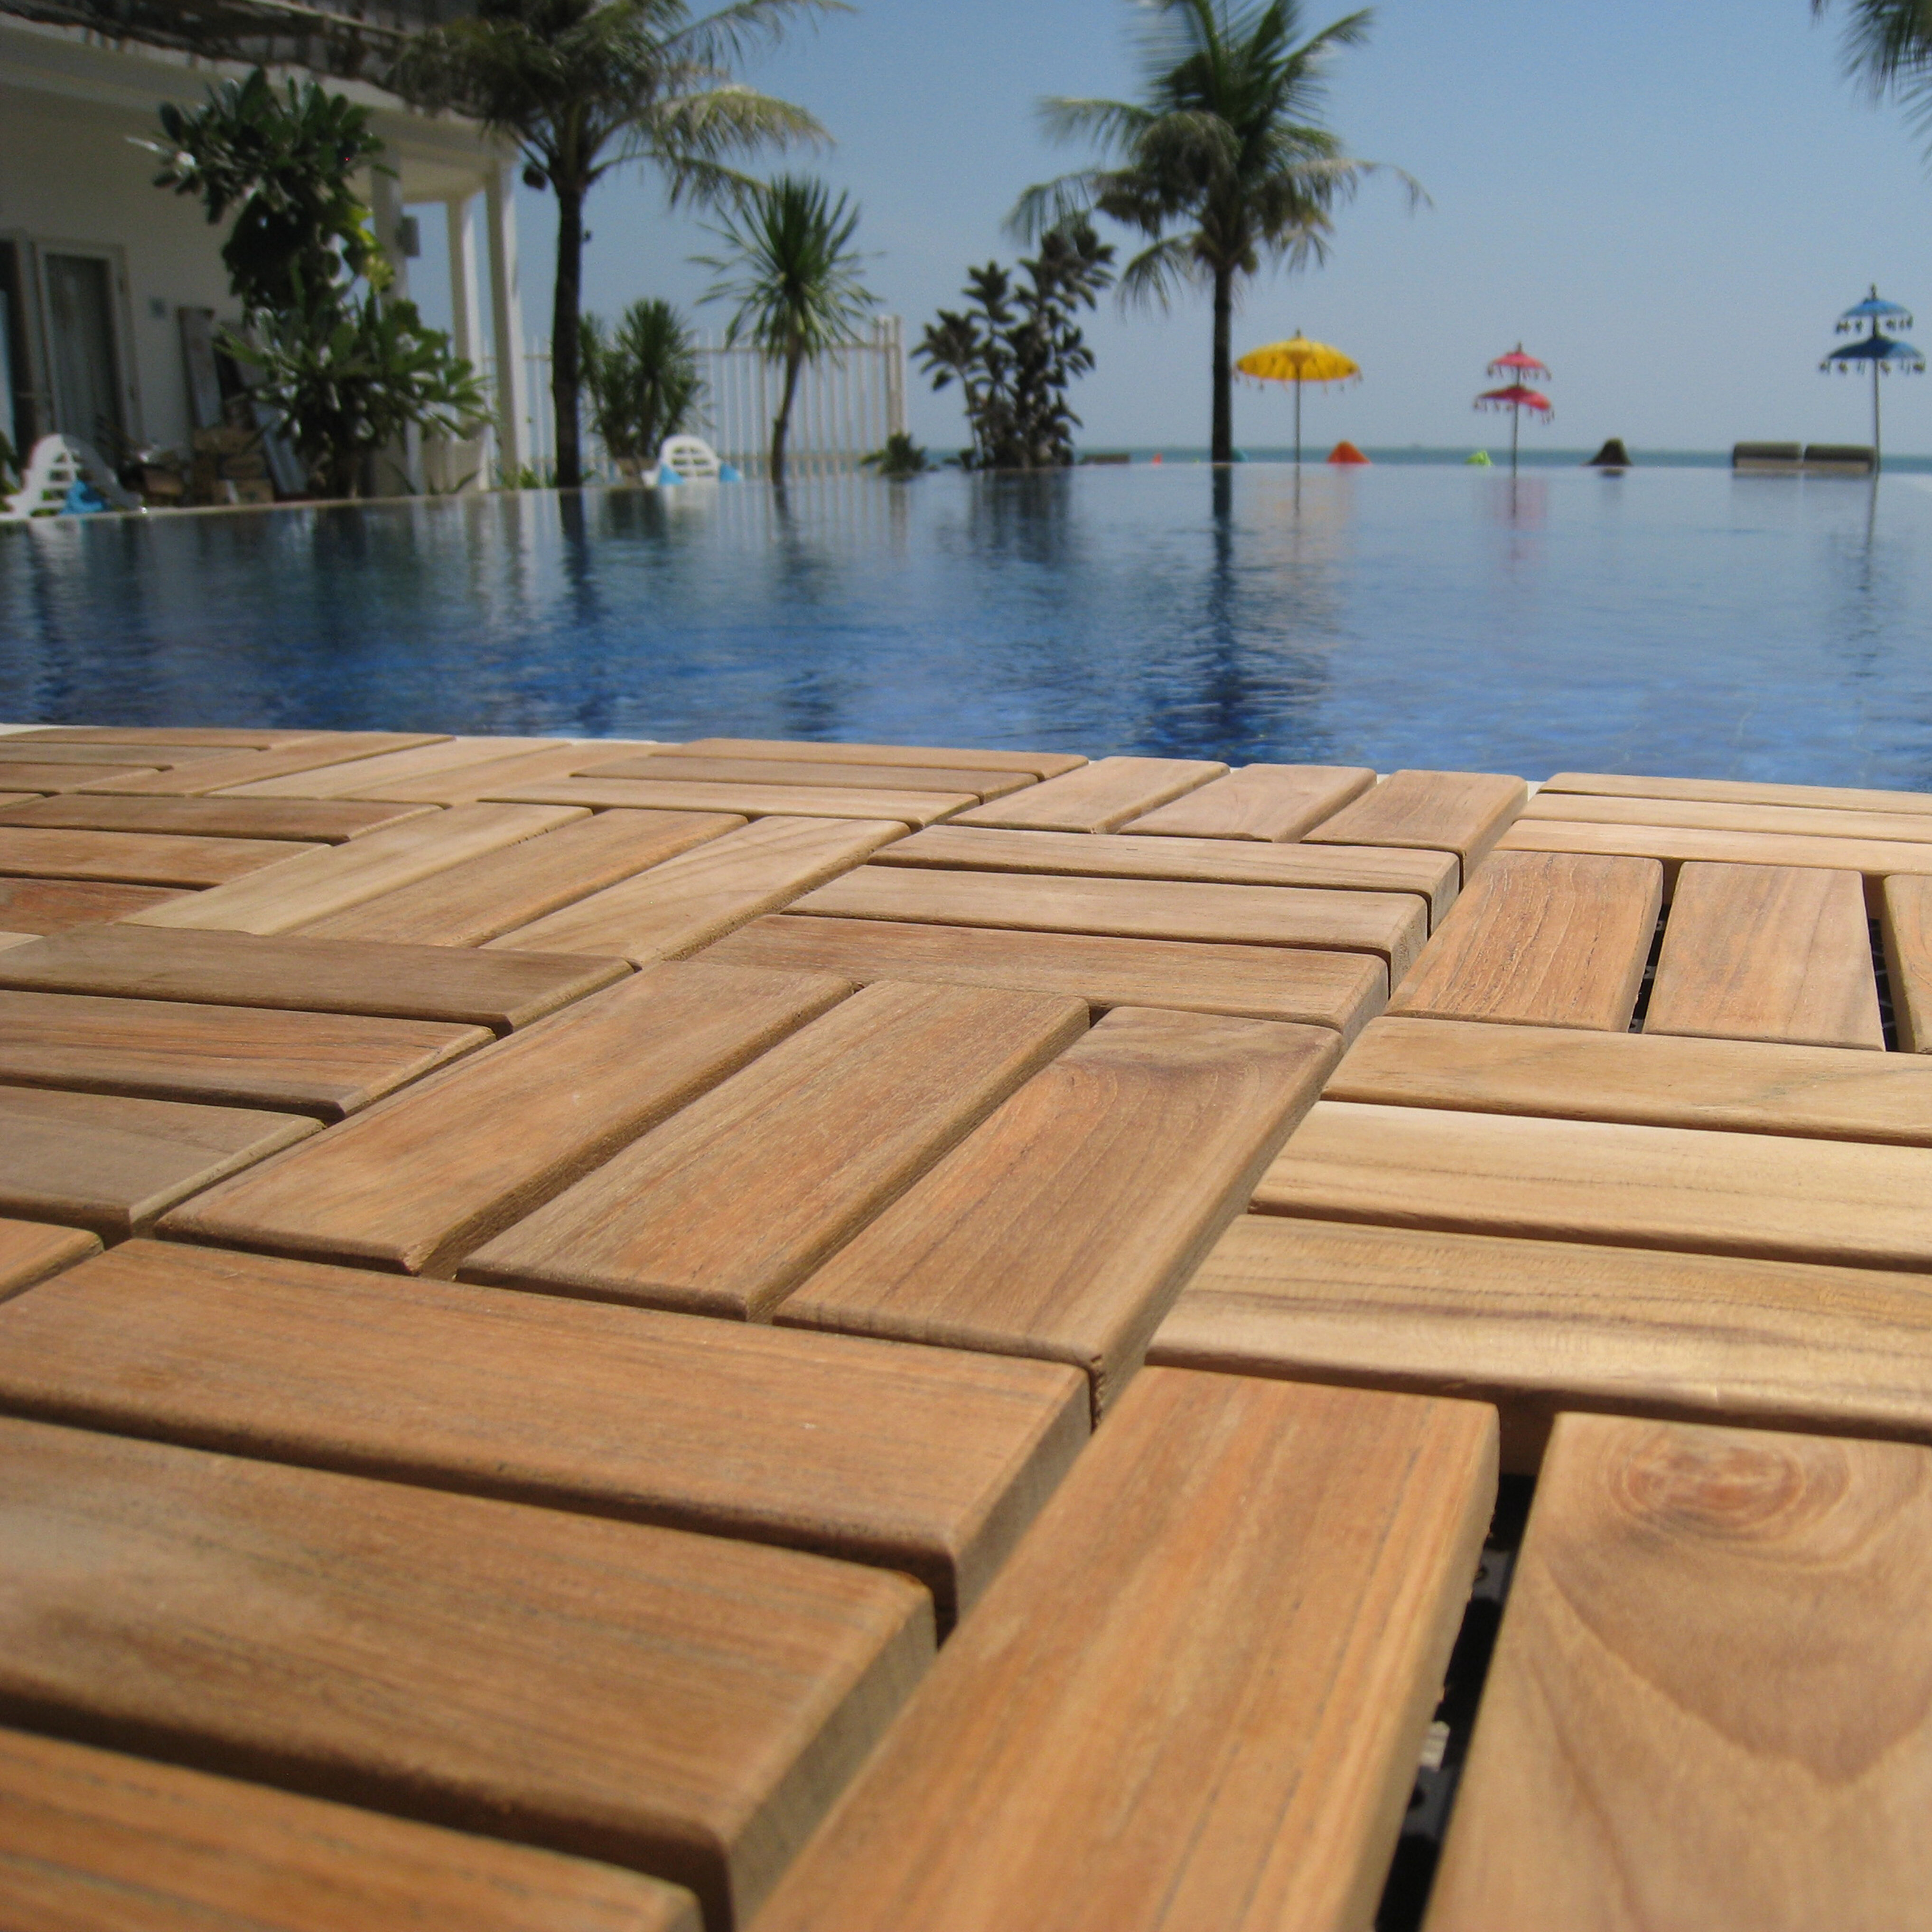 "BareDecor EZ Floor Wood 12"" x 12"" Interlocking Flooring Tile Trim"